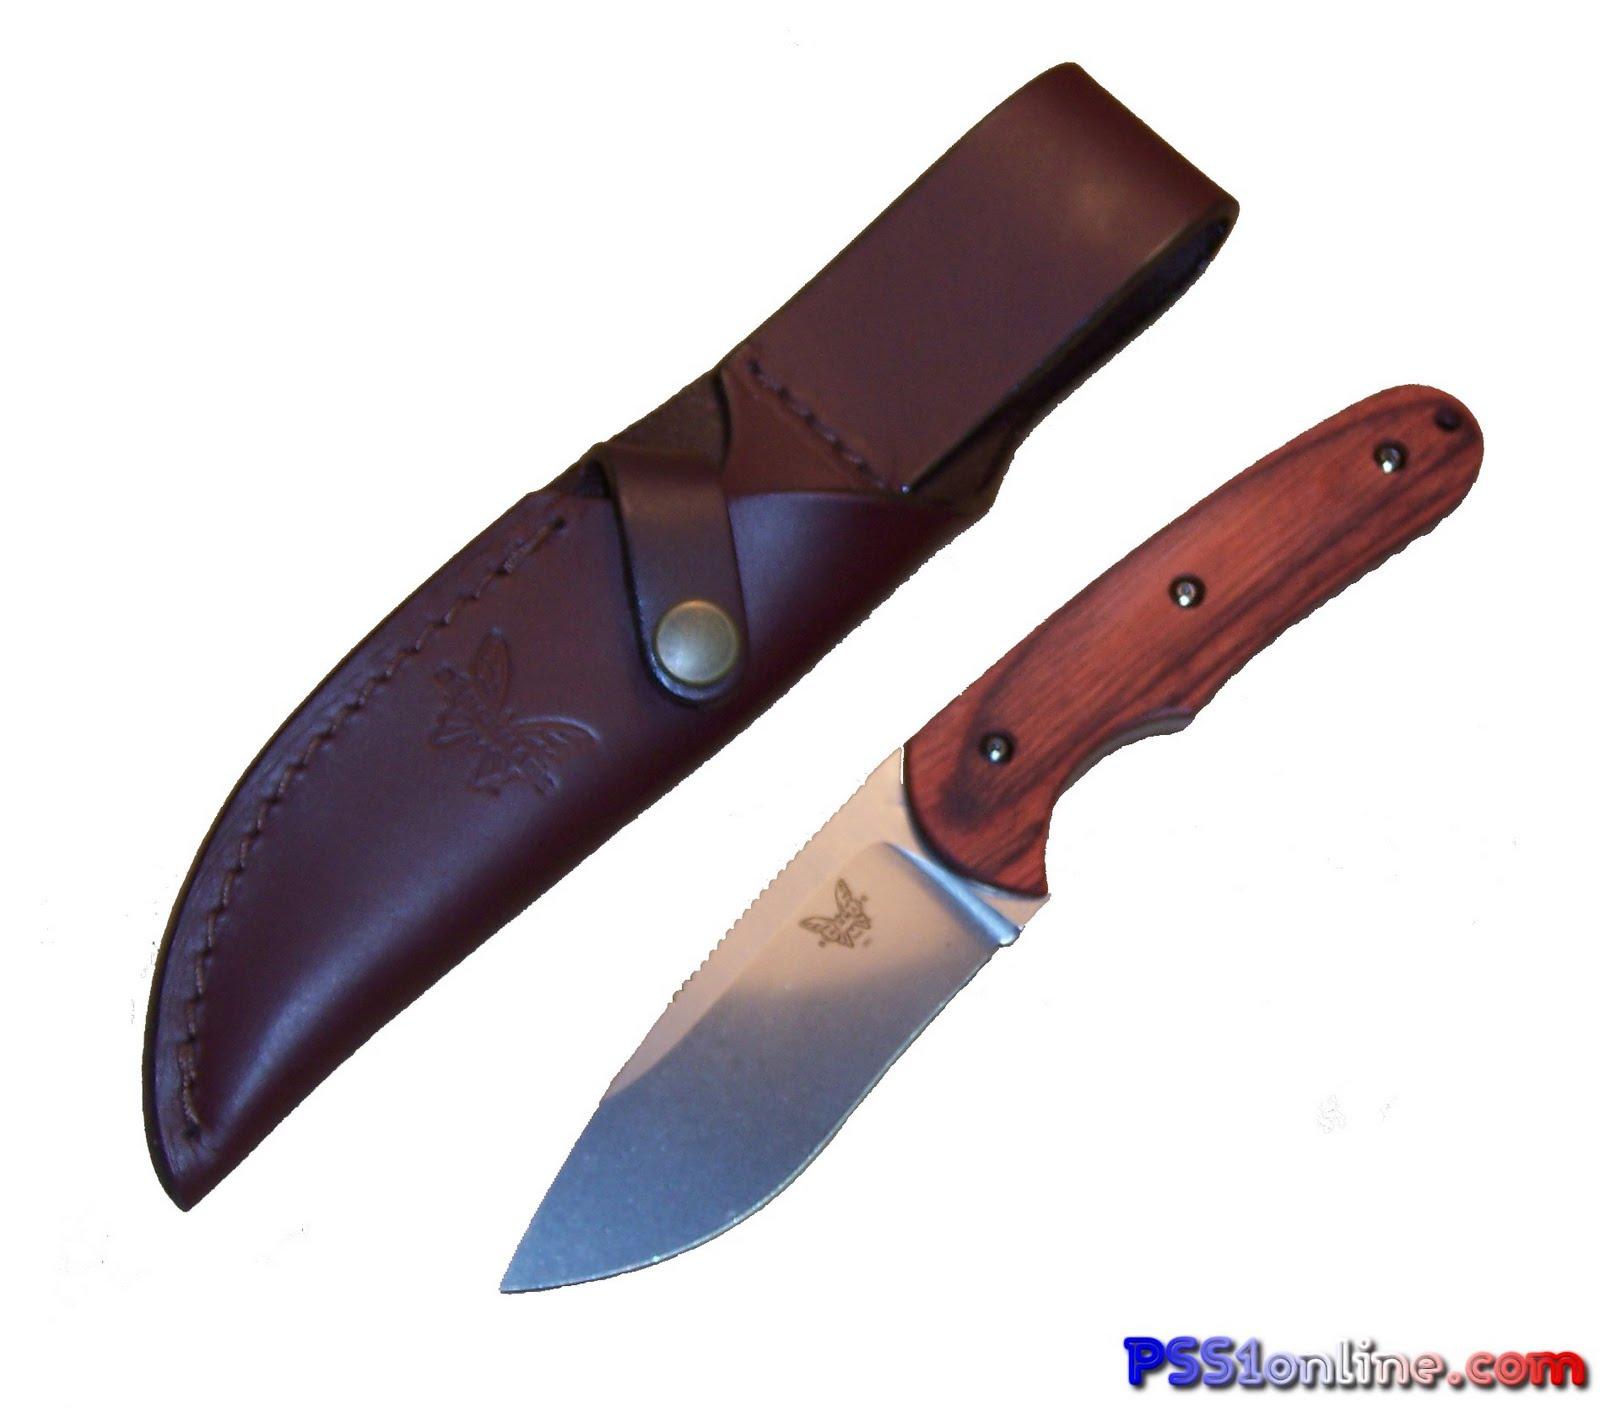 Benchmade Activator® Knives | PSS1online.com Blog